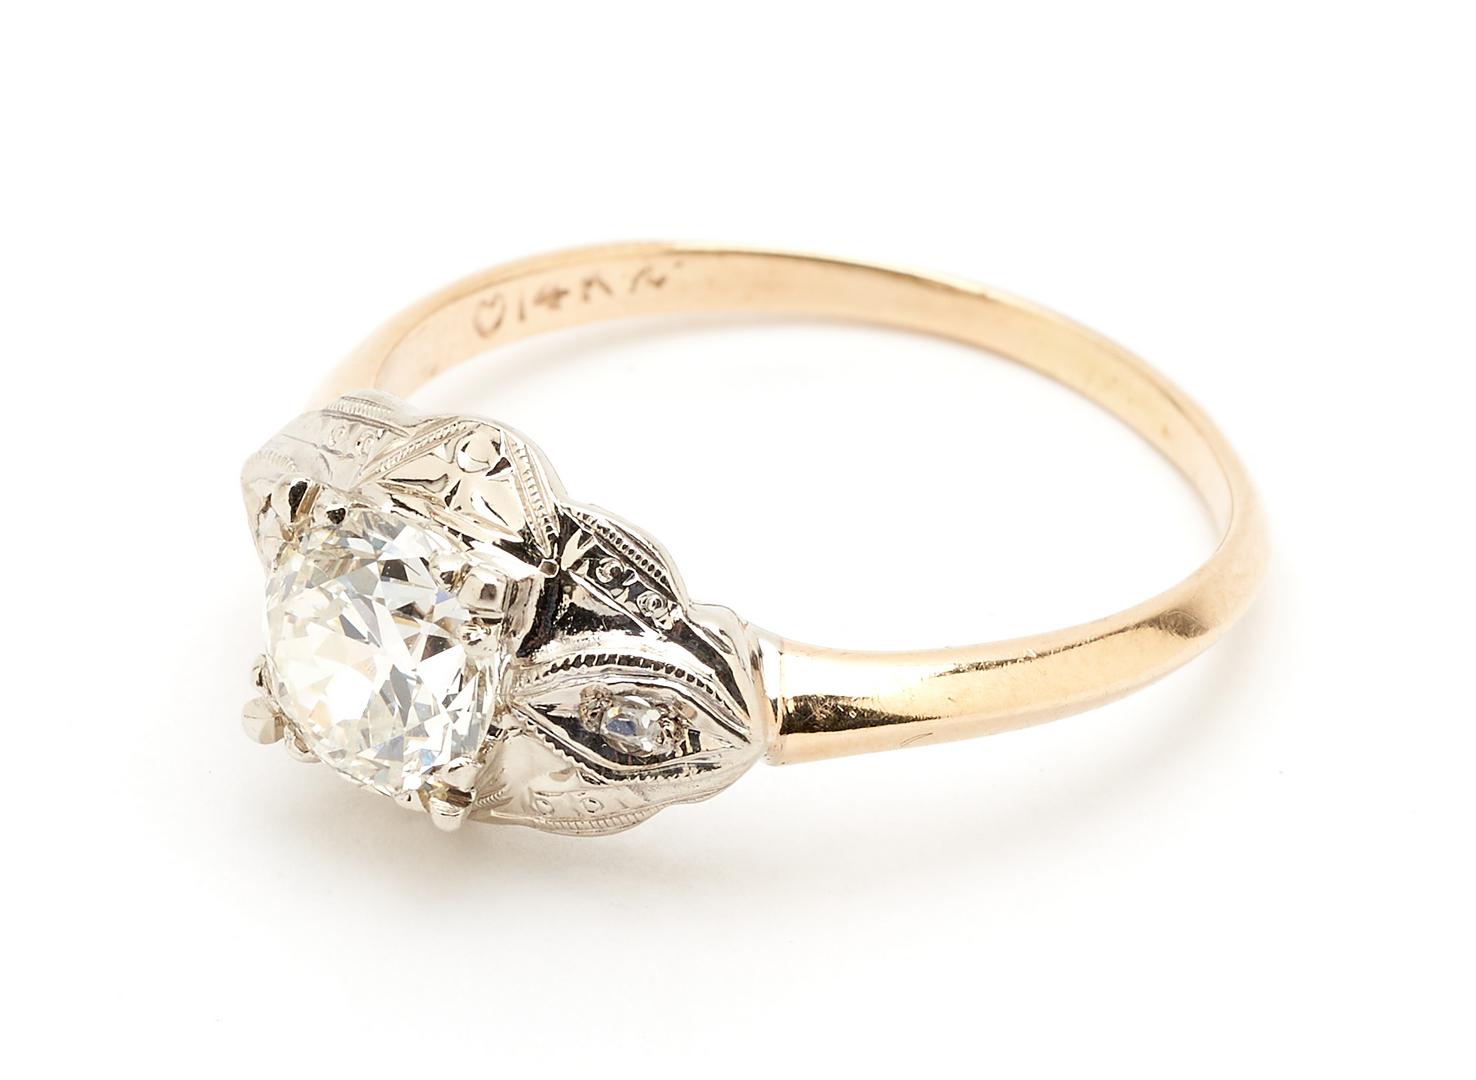 Lot 64: 14K Vintage European Diamond Ring